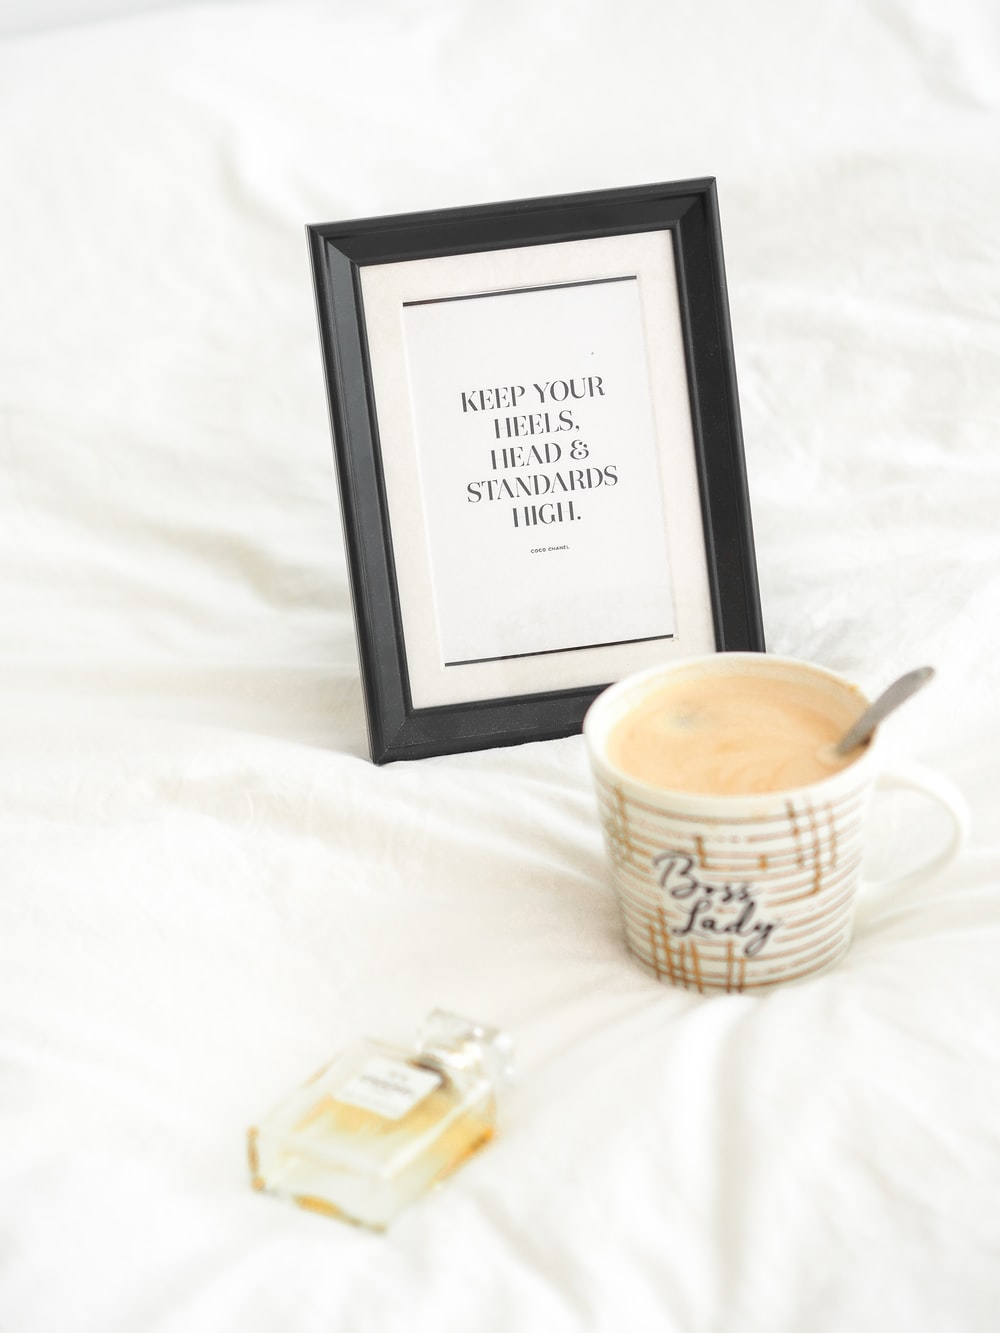 black wooden photo frame beside white and brown ceramic mug